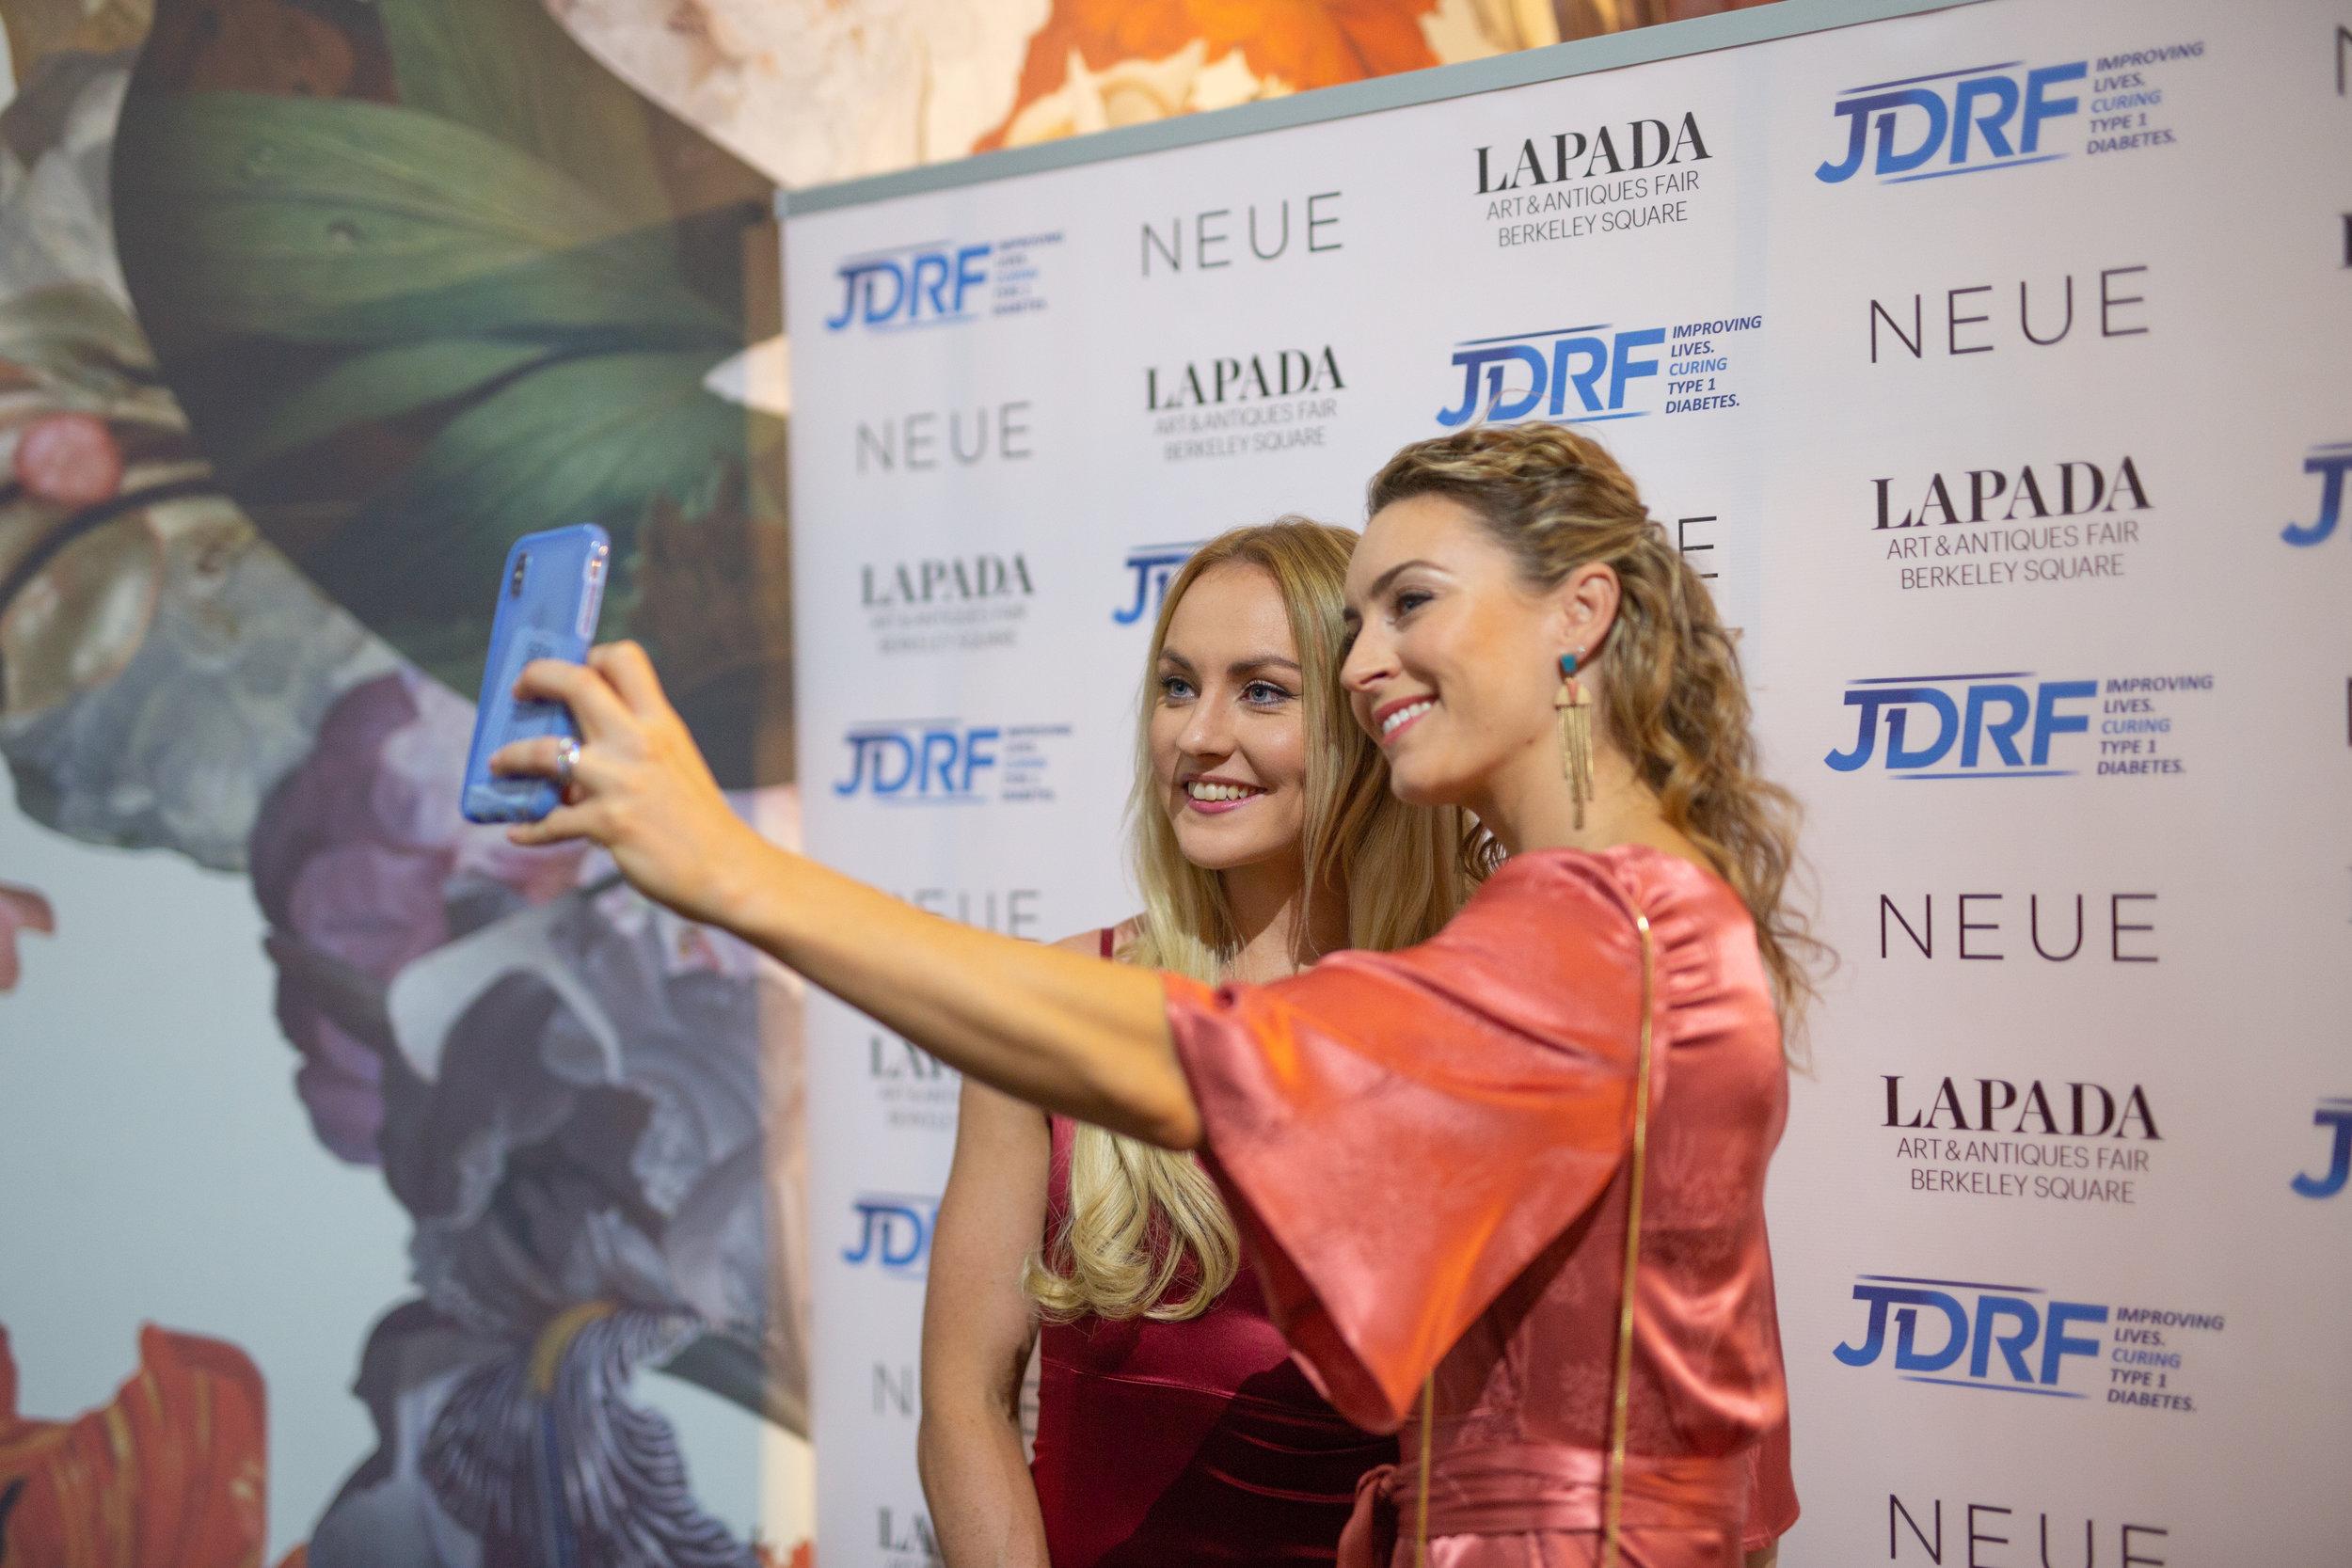 JDRF-LAPADA-36.jpg